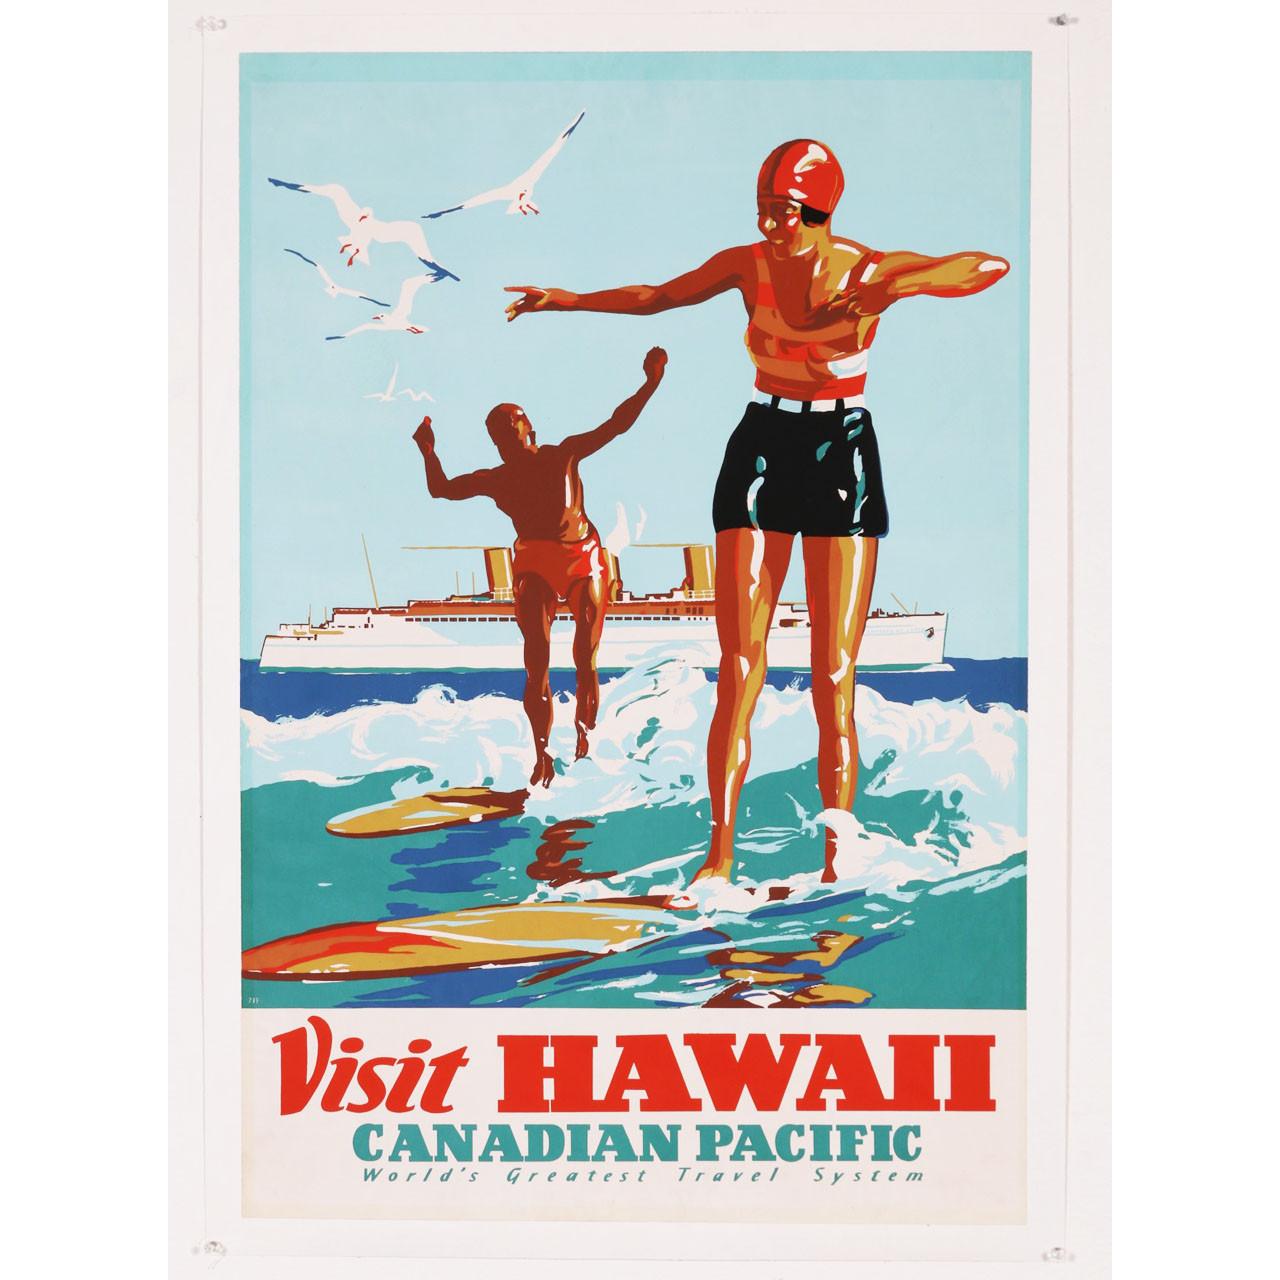 Original Vintage Canadian Pacific Hawaii Surf Travel